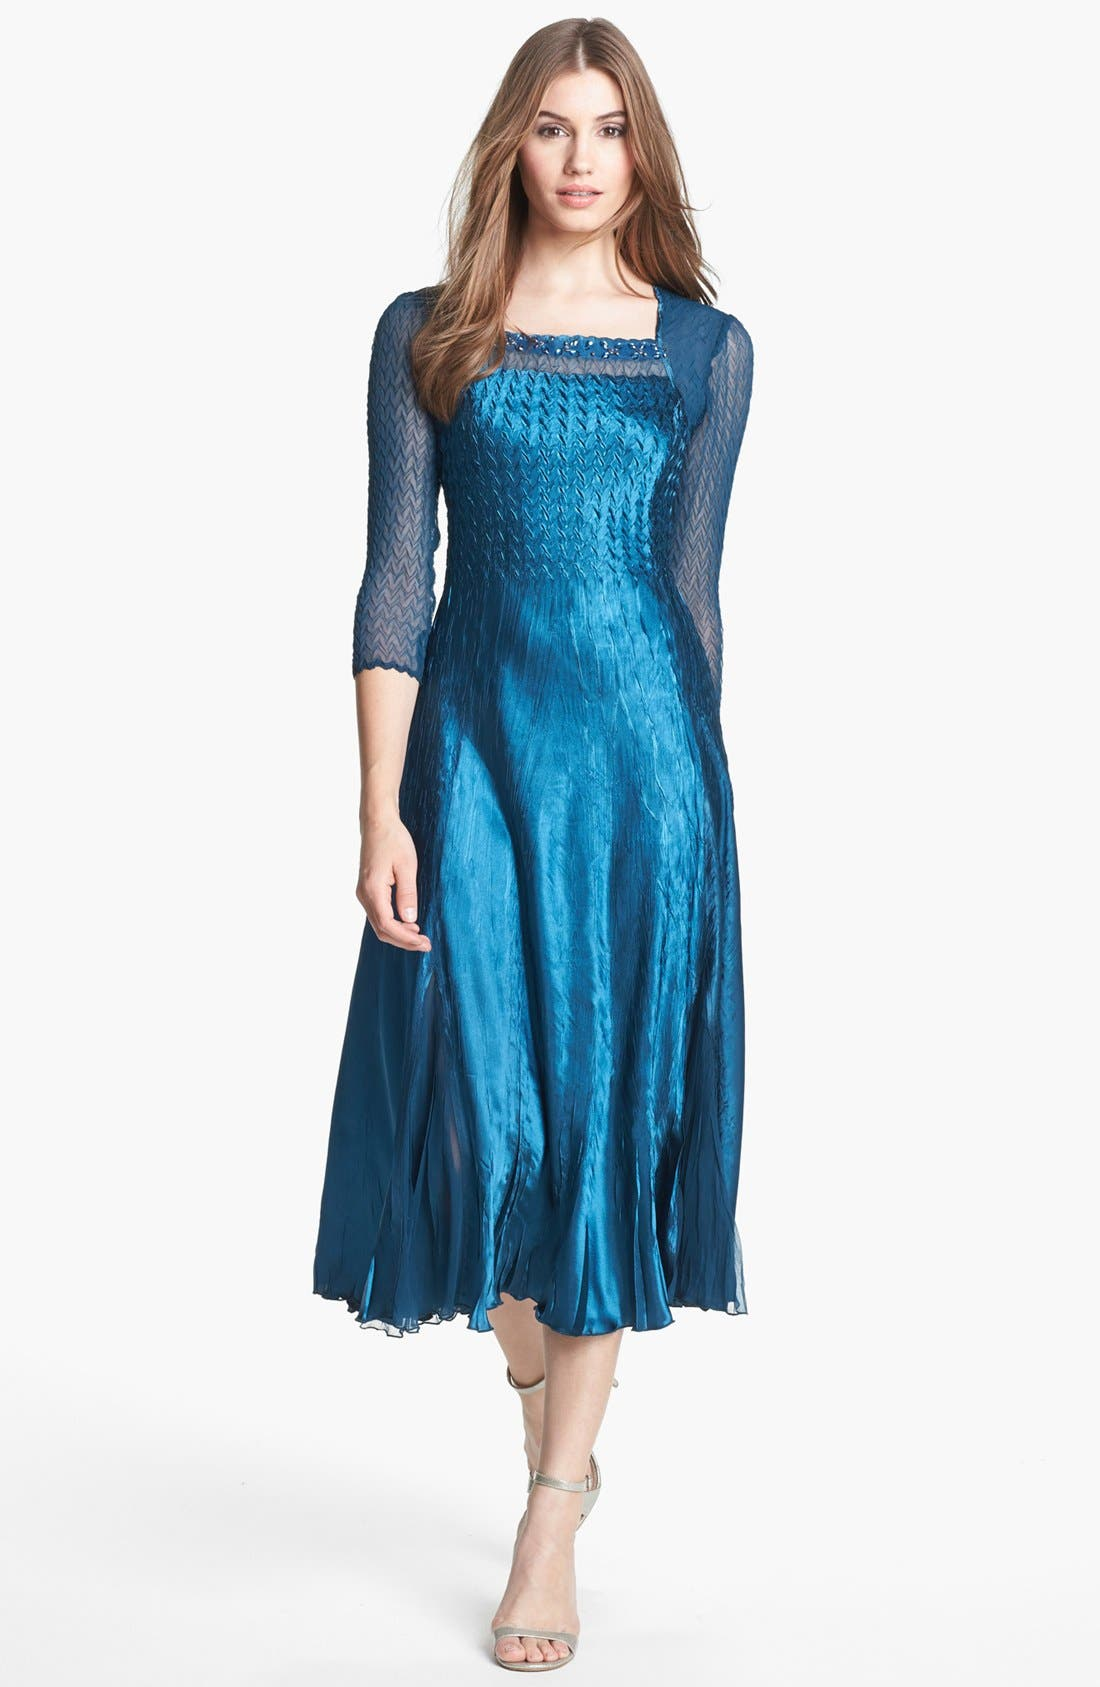 Main Image - Komarov Sheer Sleeve Textured Charmeuse Dress